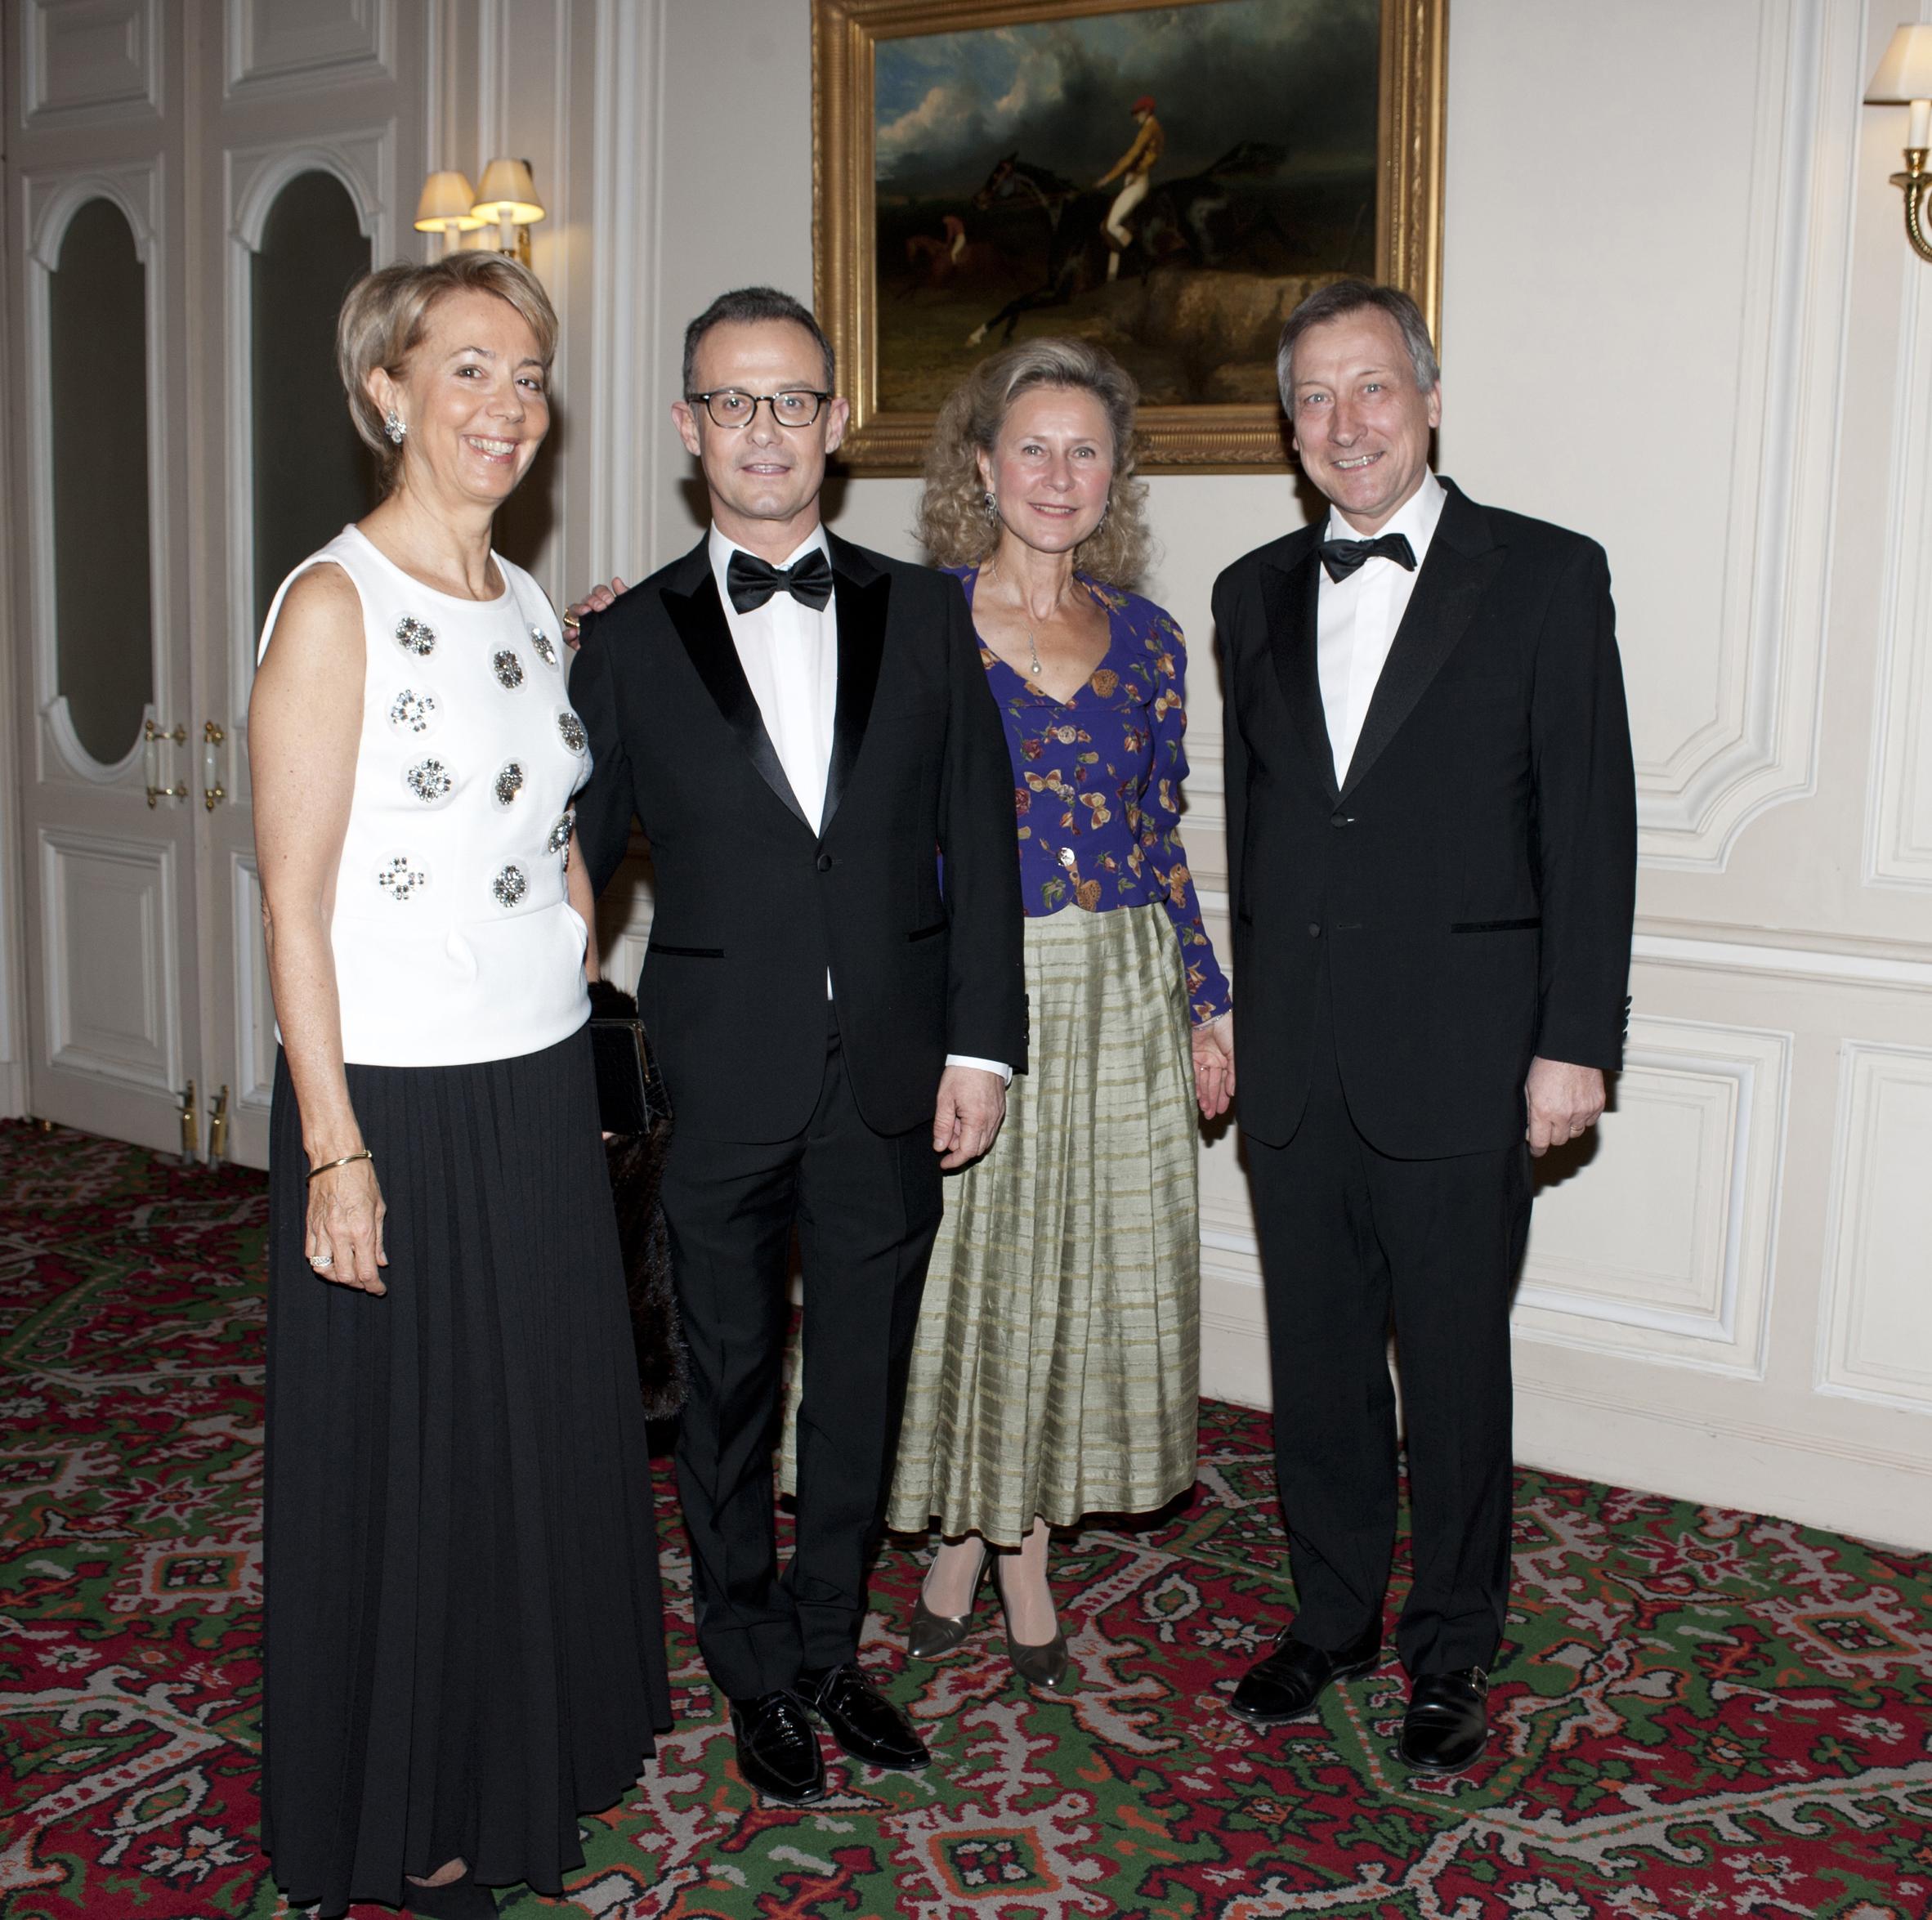 Mme Vincent MERTENS de WILMARS - Francis BAILLET - Armelle CEGLEC - Vincent MERTENS de WILMARS, ambassadeur de Belgique